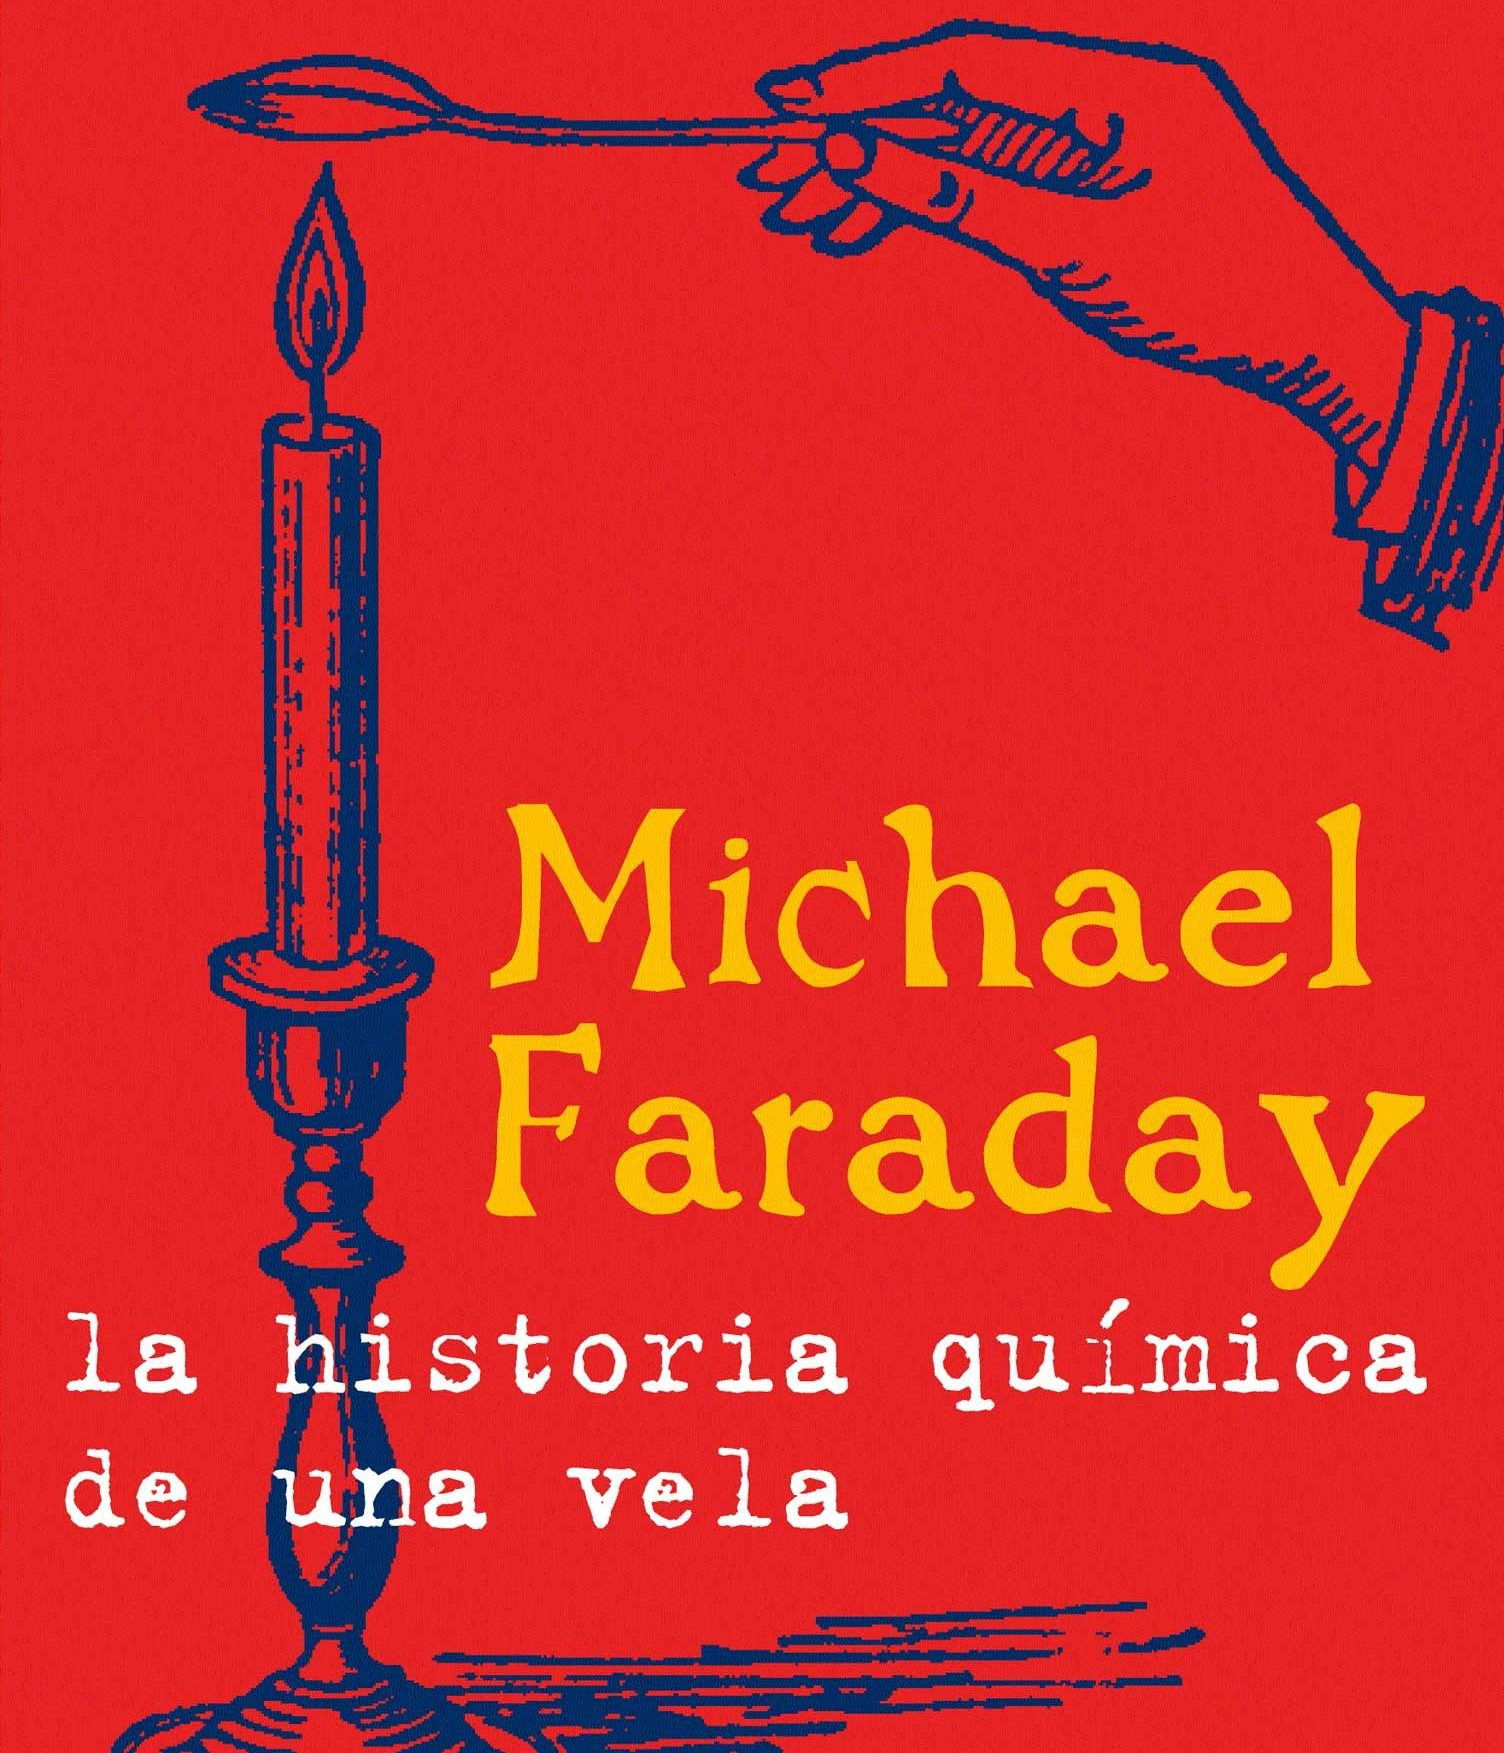 michael faraday 16